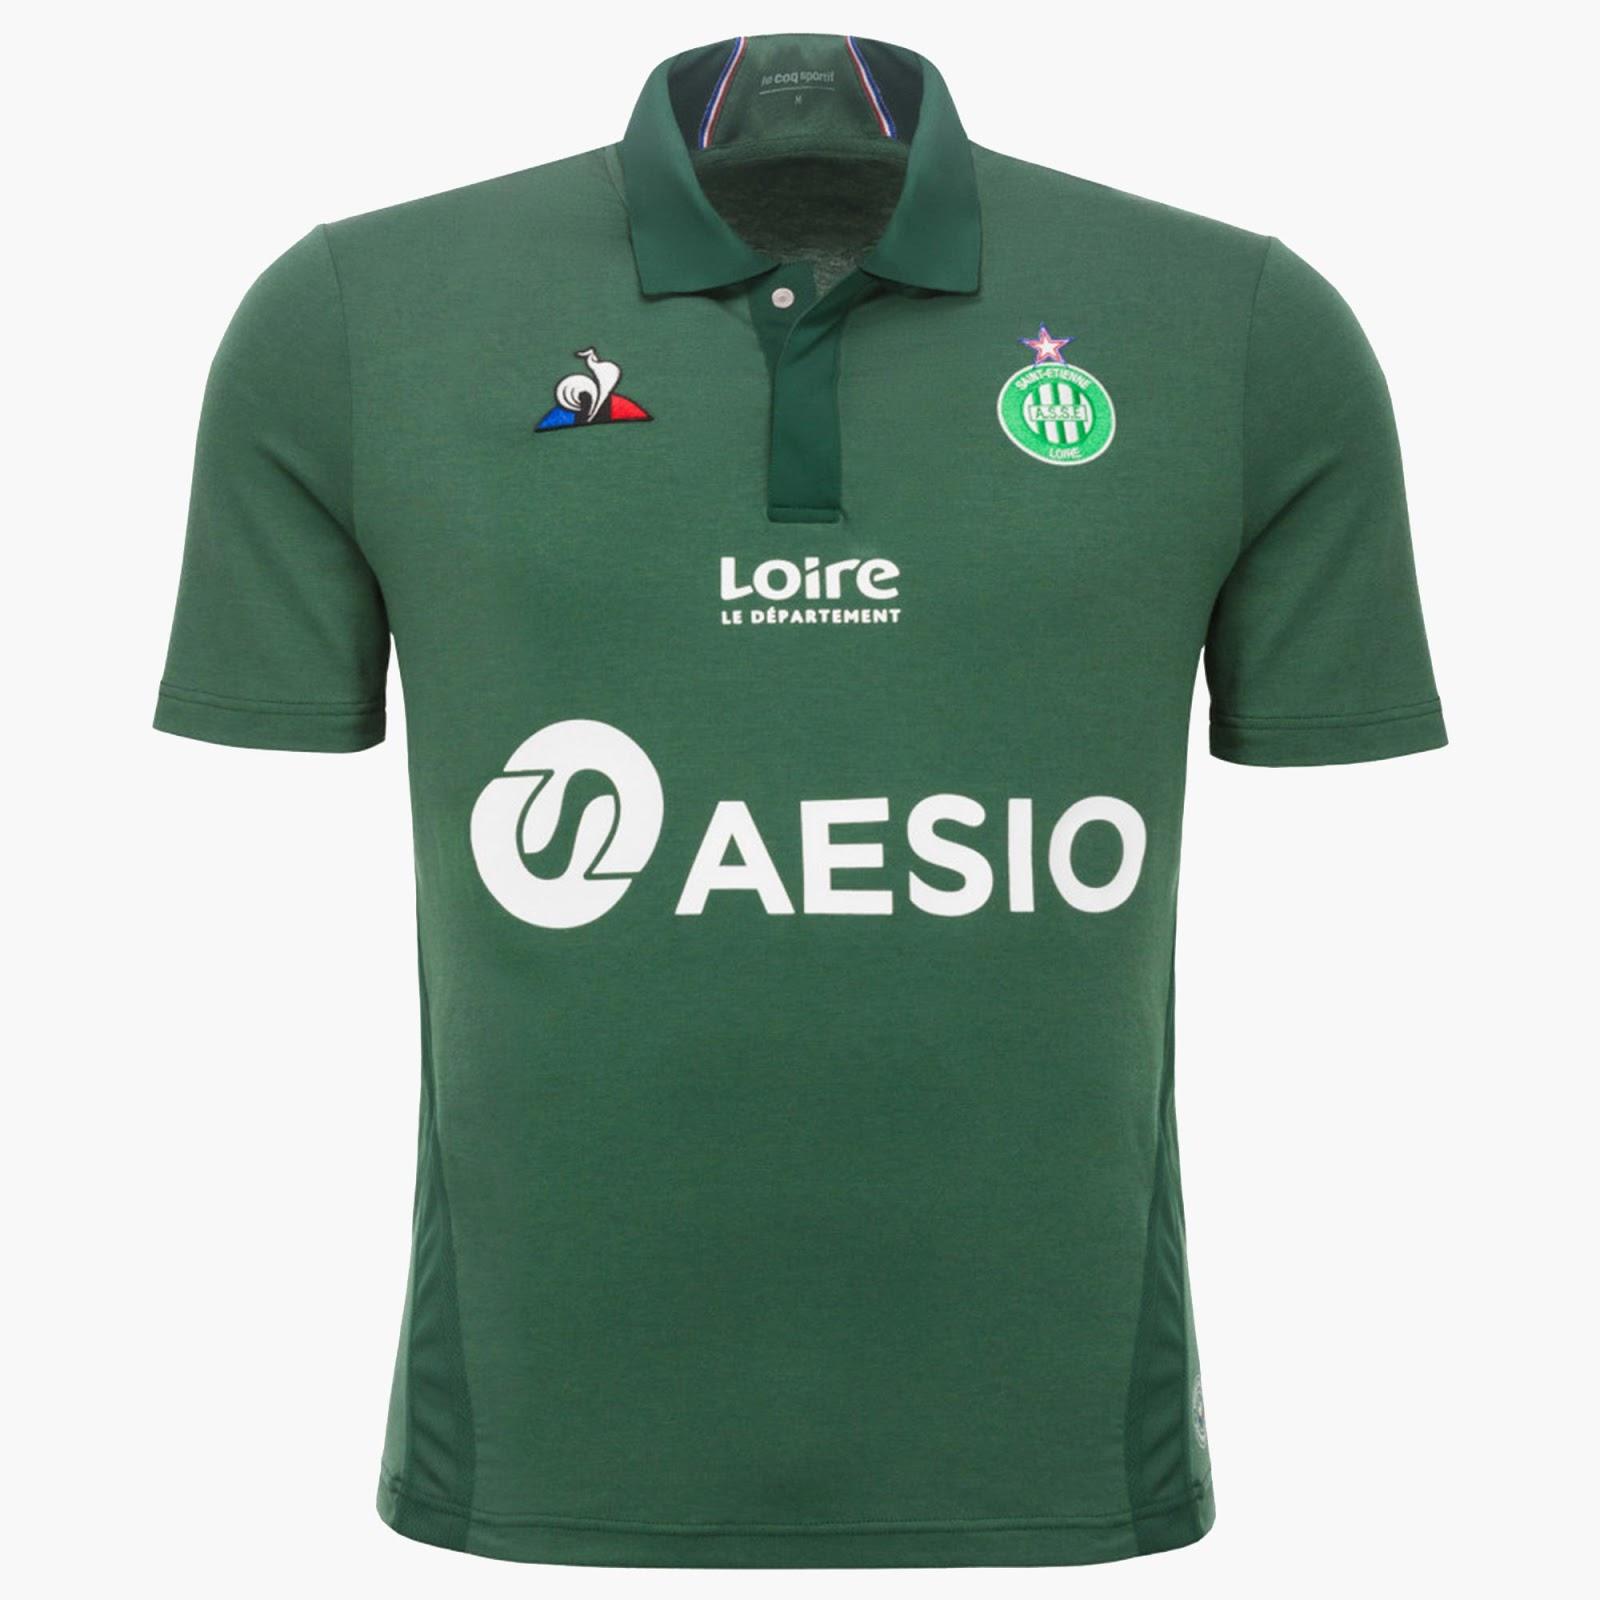 http://www.maillots-foot-actu.fr/wp-content/uploads/2018/07/ASSE-2019-maillot-domicile-foot-Saint-Etienne.jpg?w=400&h=475